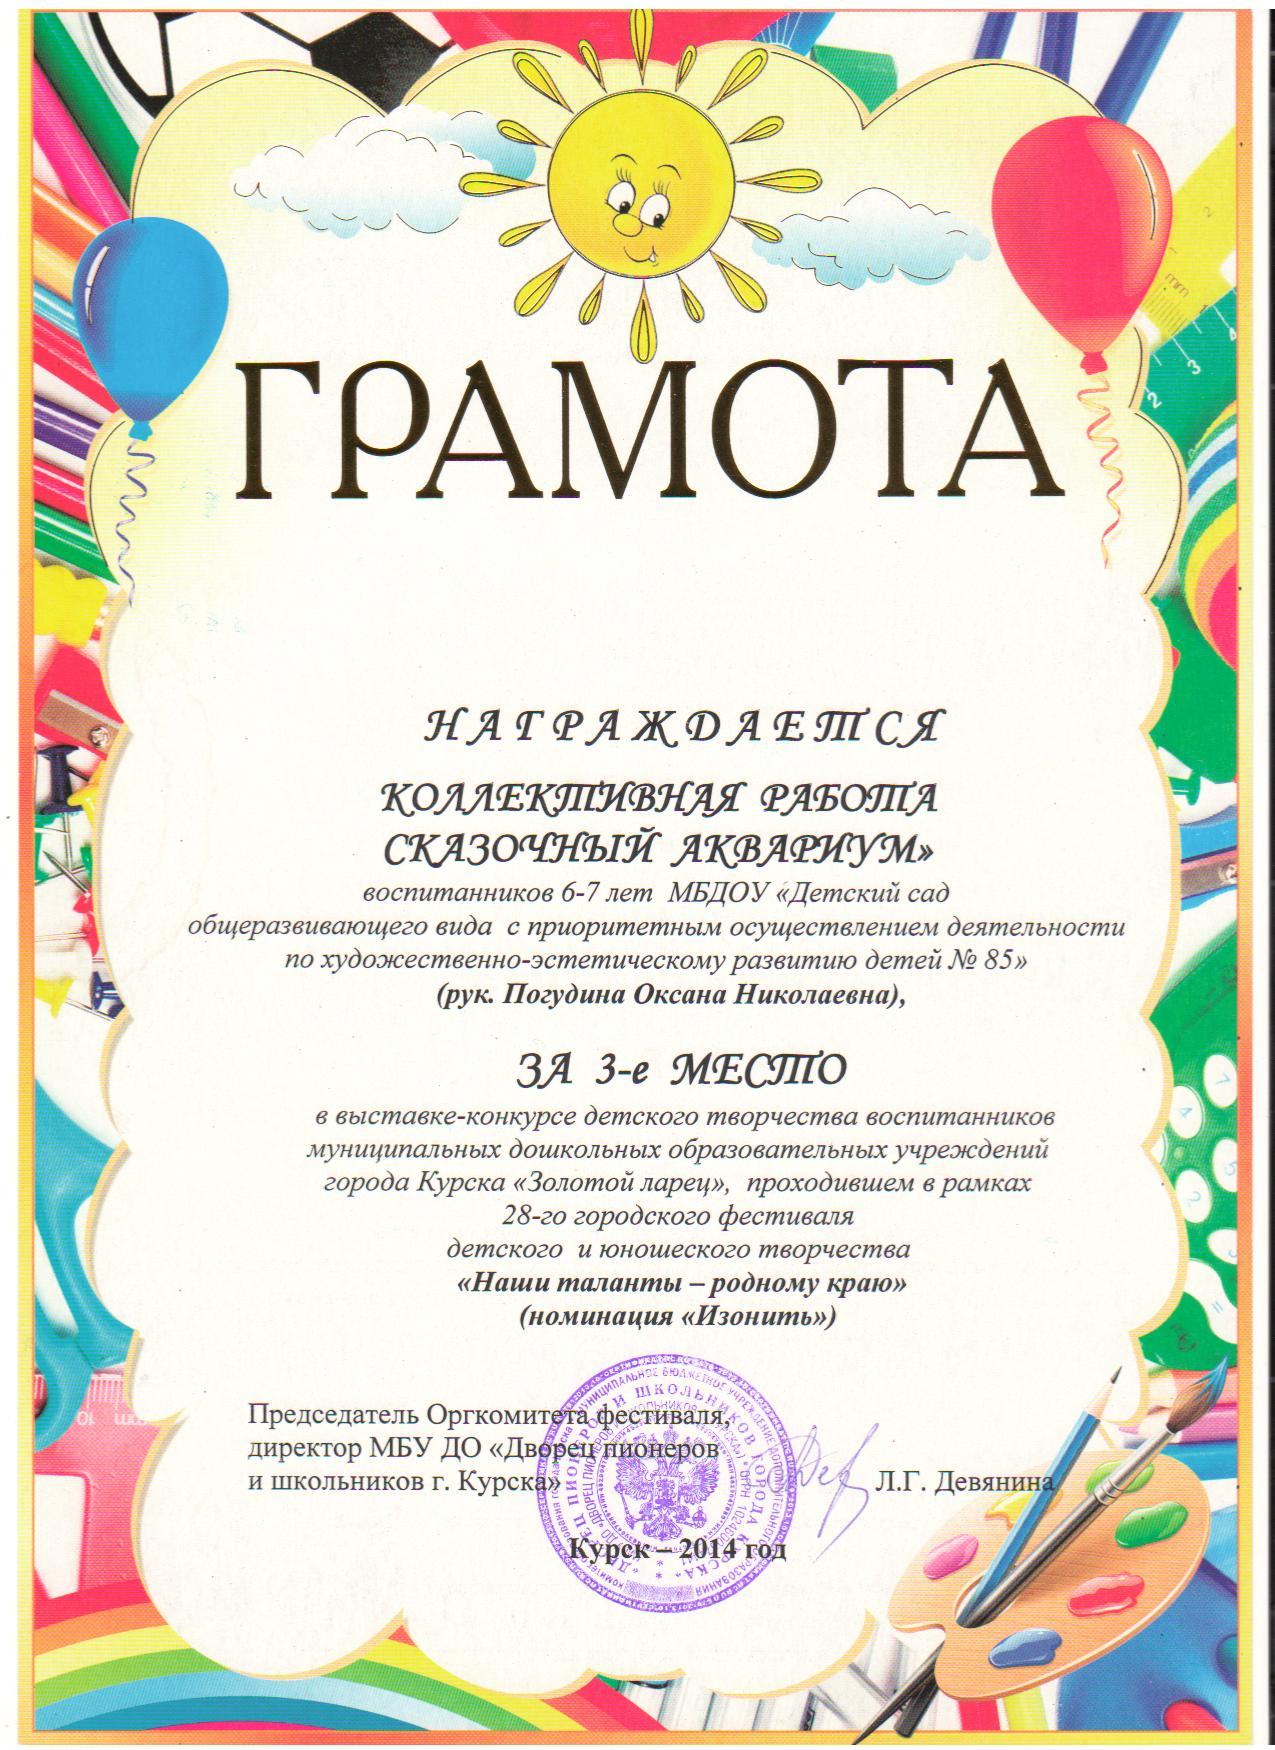 2 Сведения об операциях с целевыми субсидиями на 2013г.-30.12.13г- 001